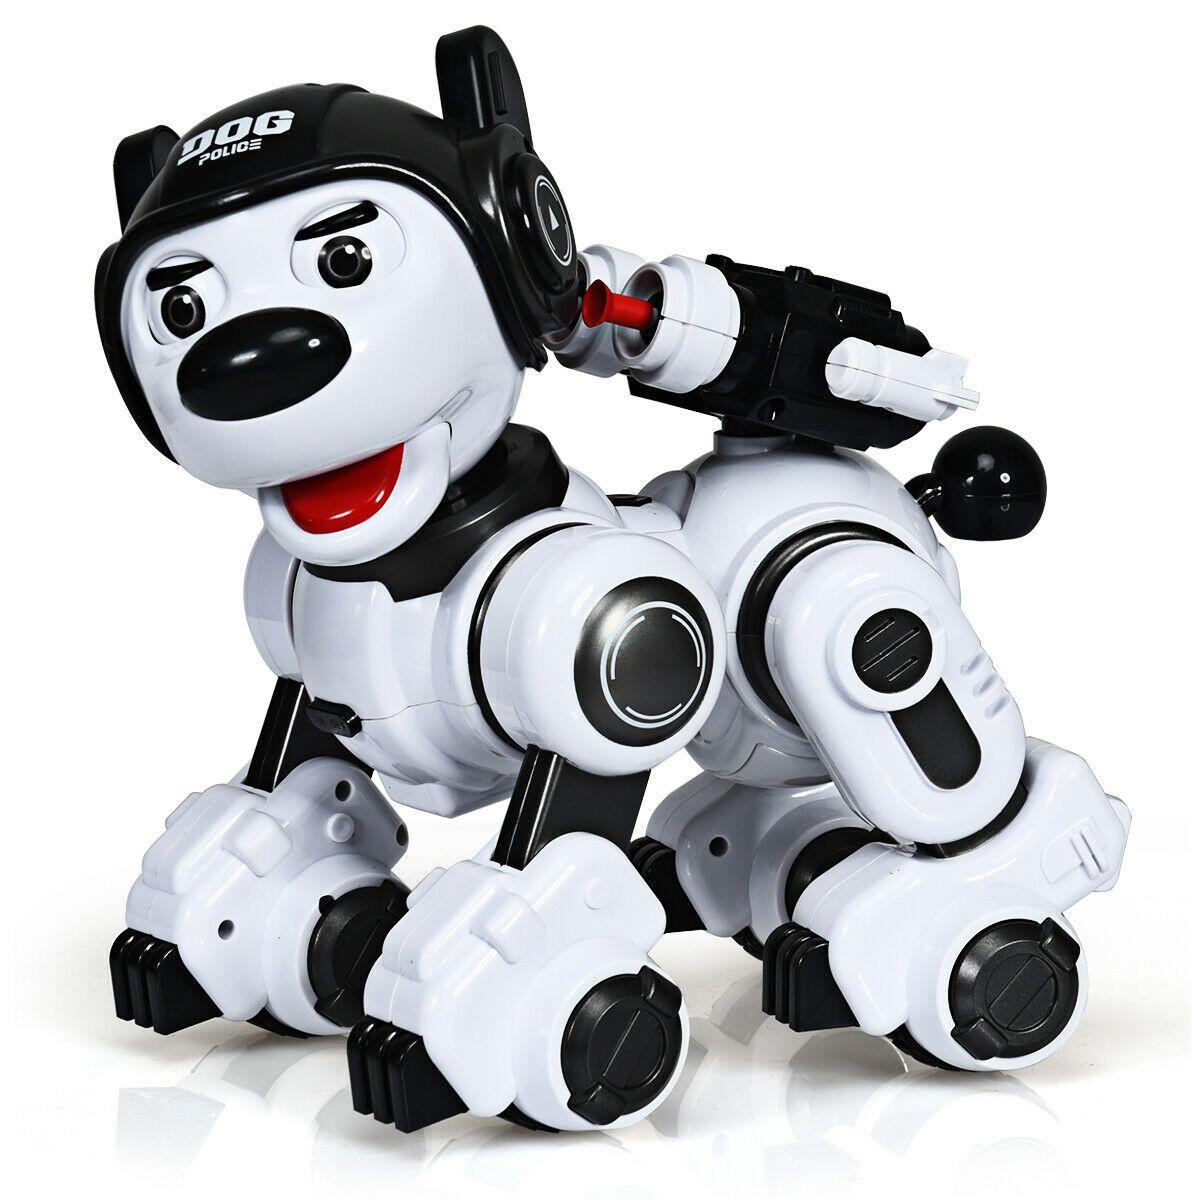 Wireless Programmable Interactive Remote Control Robotic Dog Black